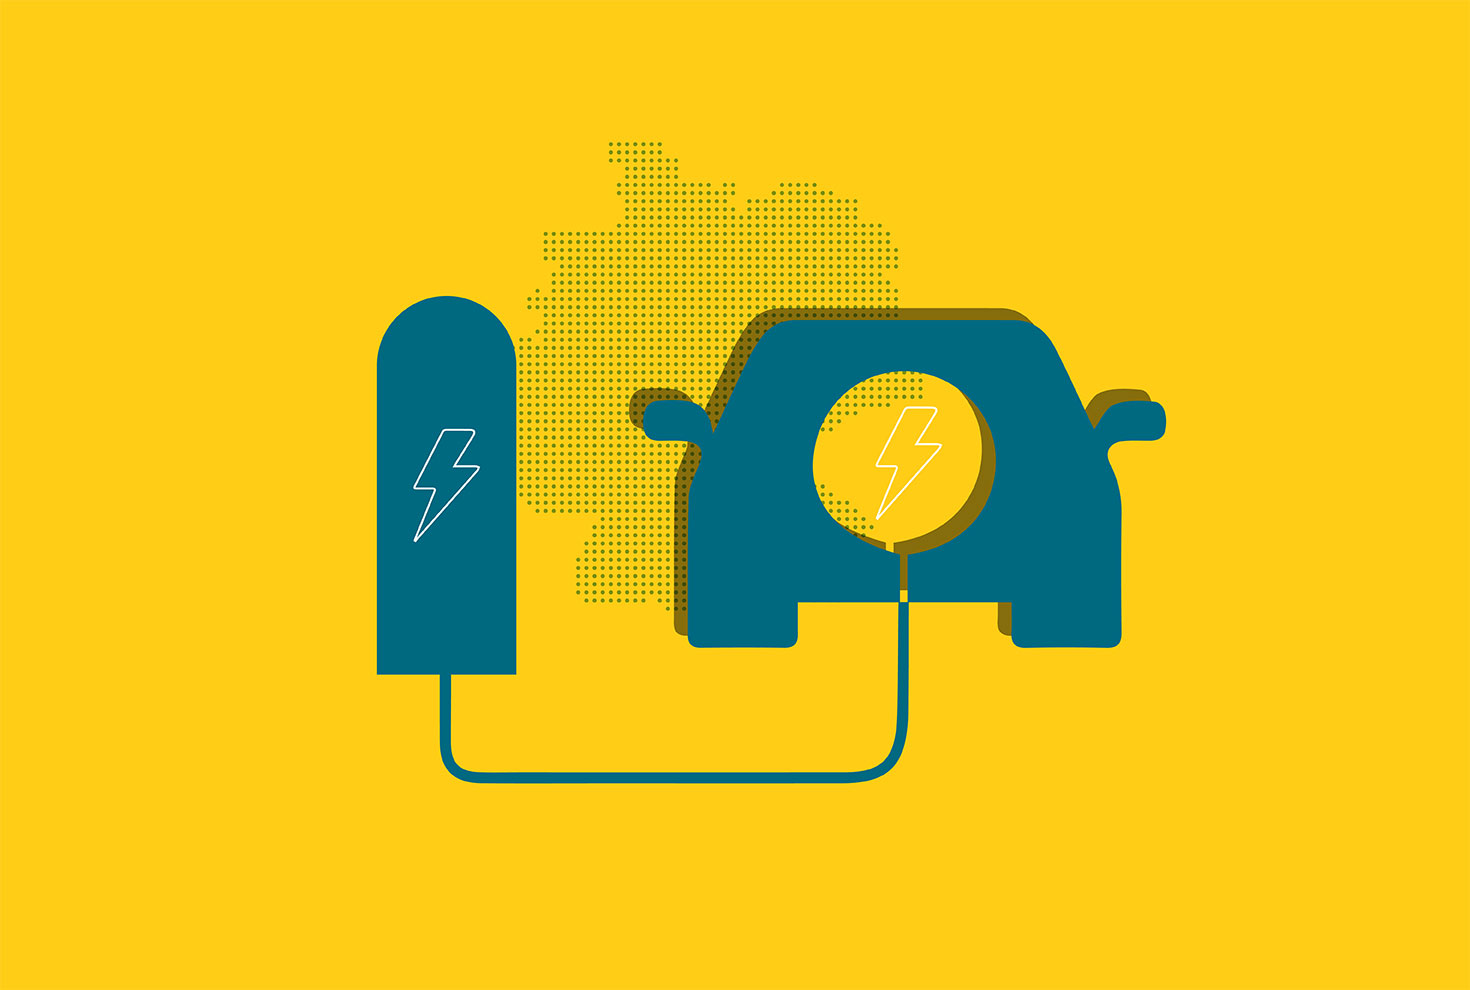 staatliche-supercharger-02